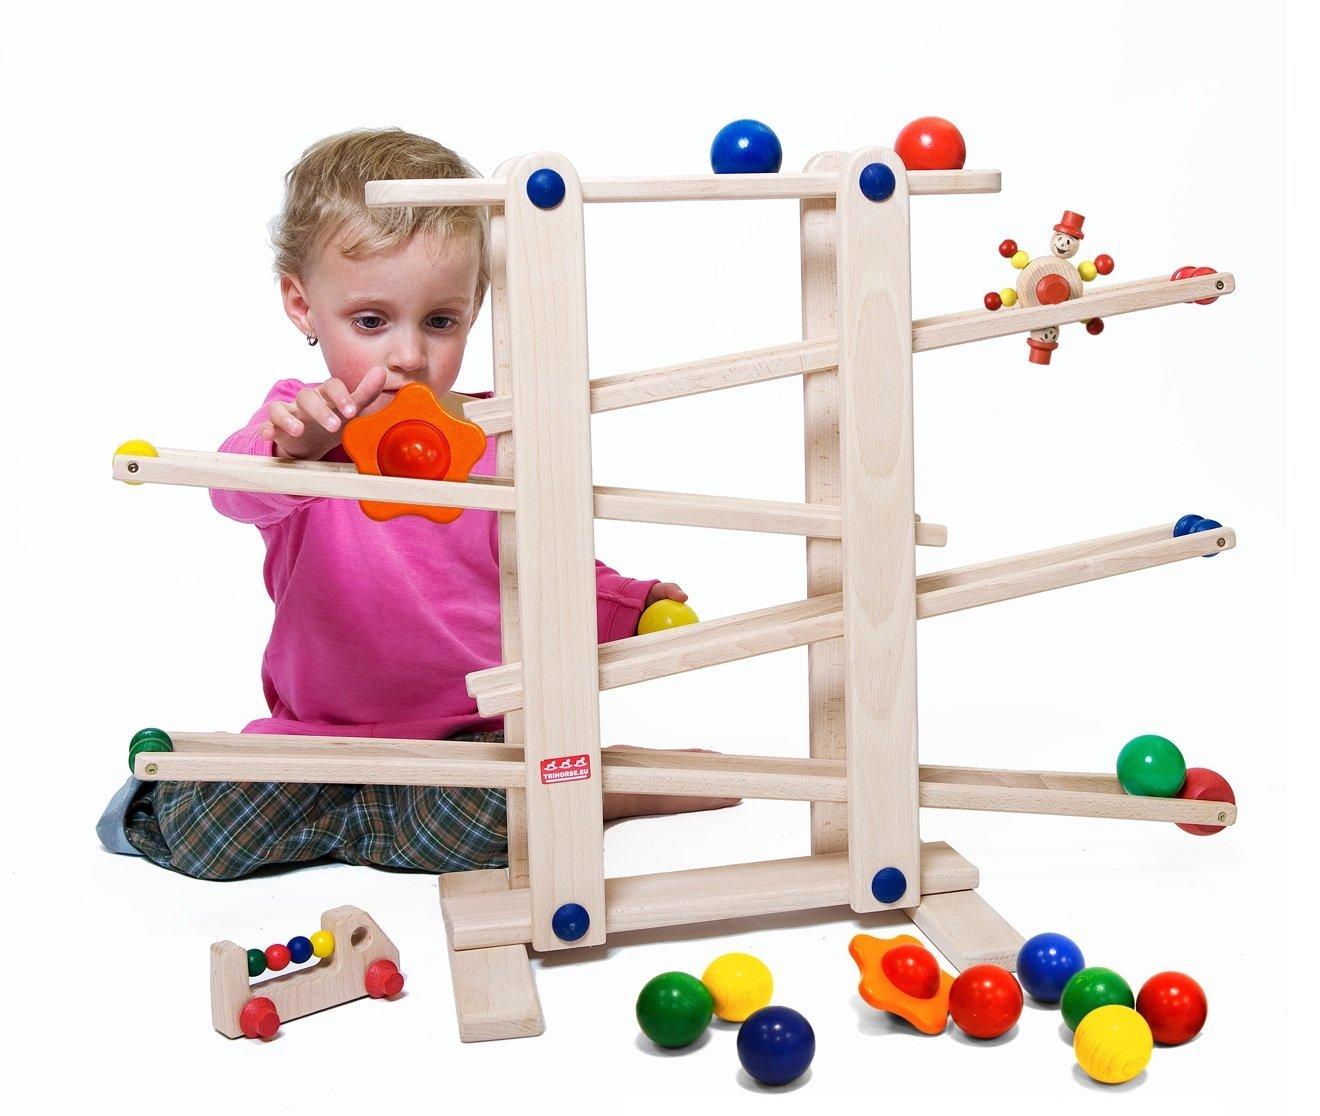 kugelbahn, Babyspielzeug